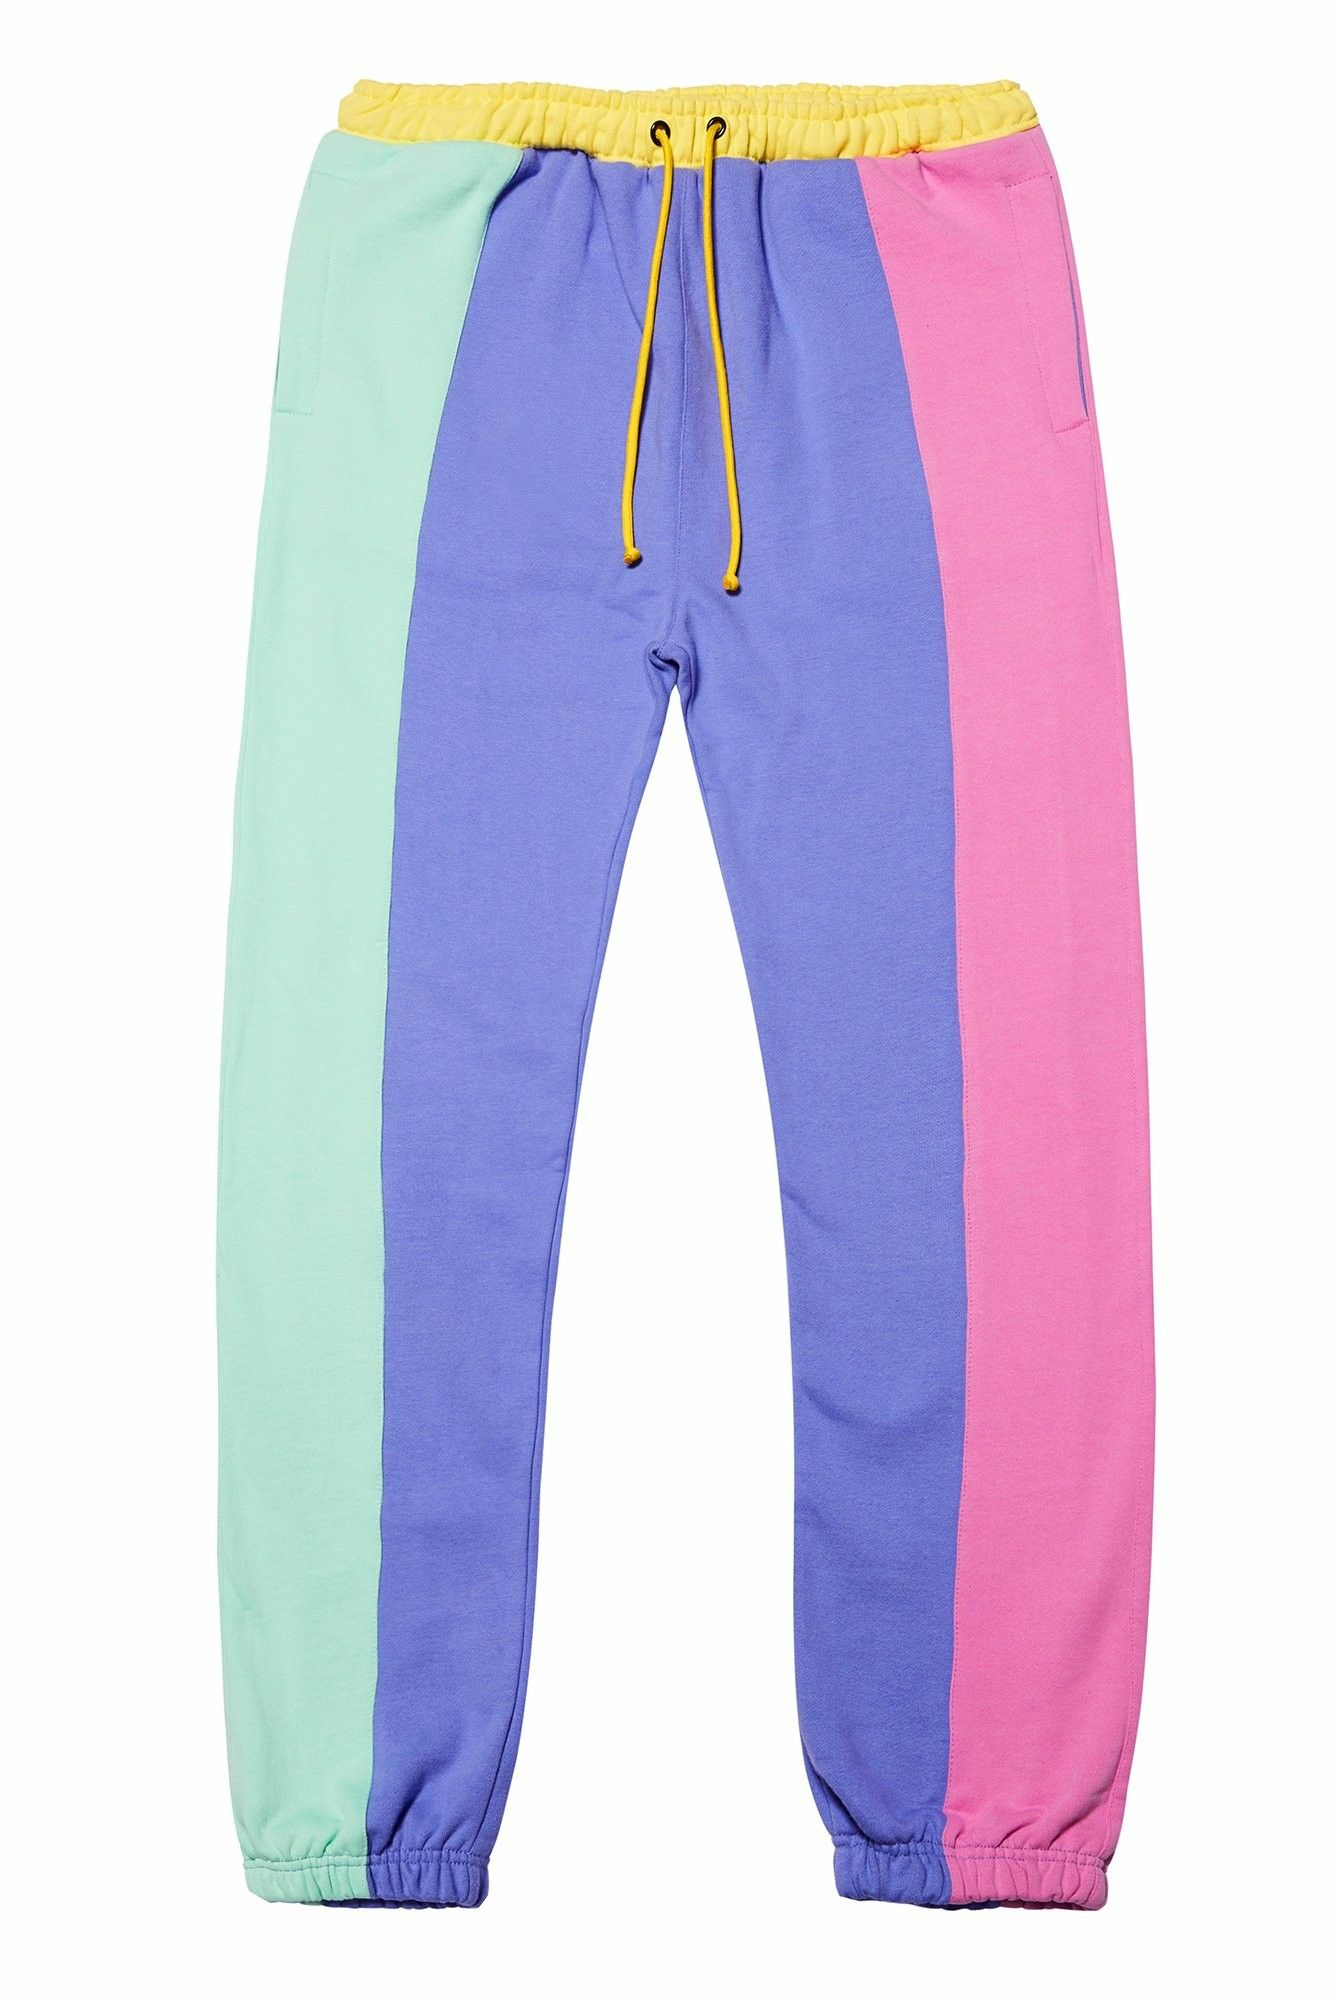 a1666f1f3f0 Pastel Pants, Pastel Clothes, Fleece Joggers, Jogger Pants, Sweatpants,  Colorful Leggings